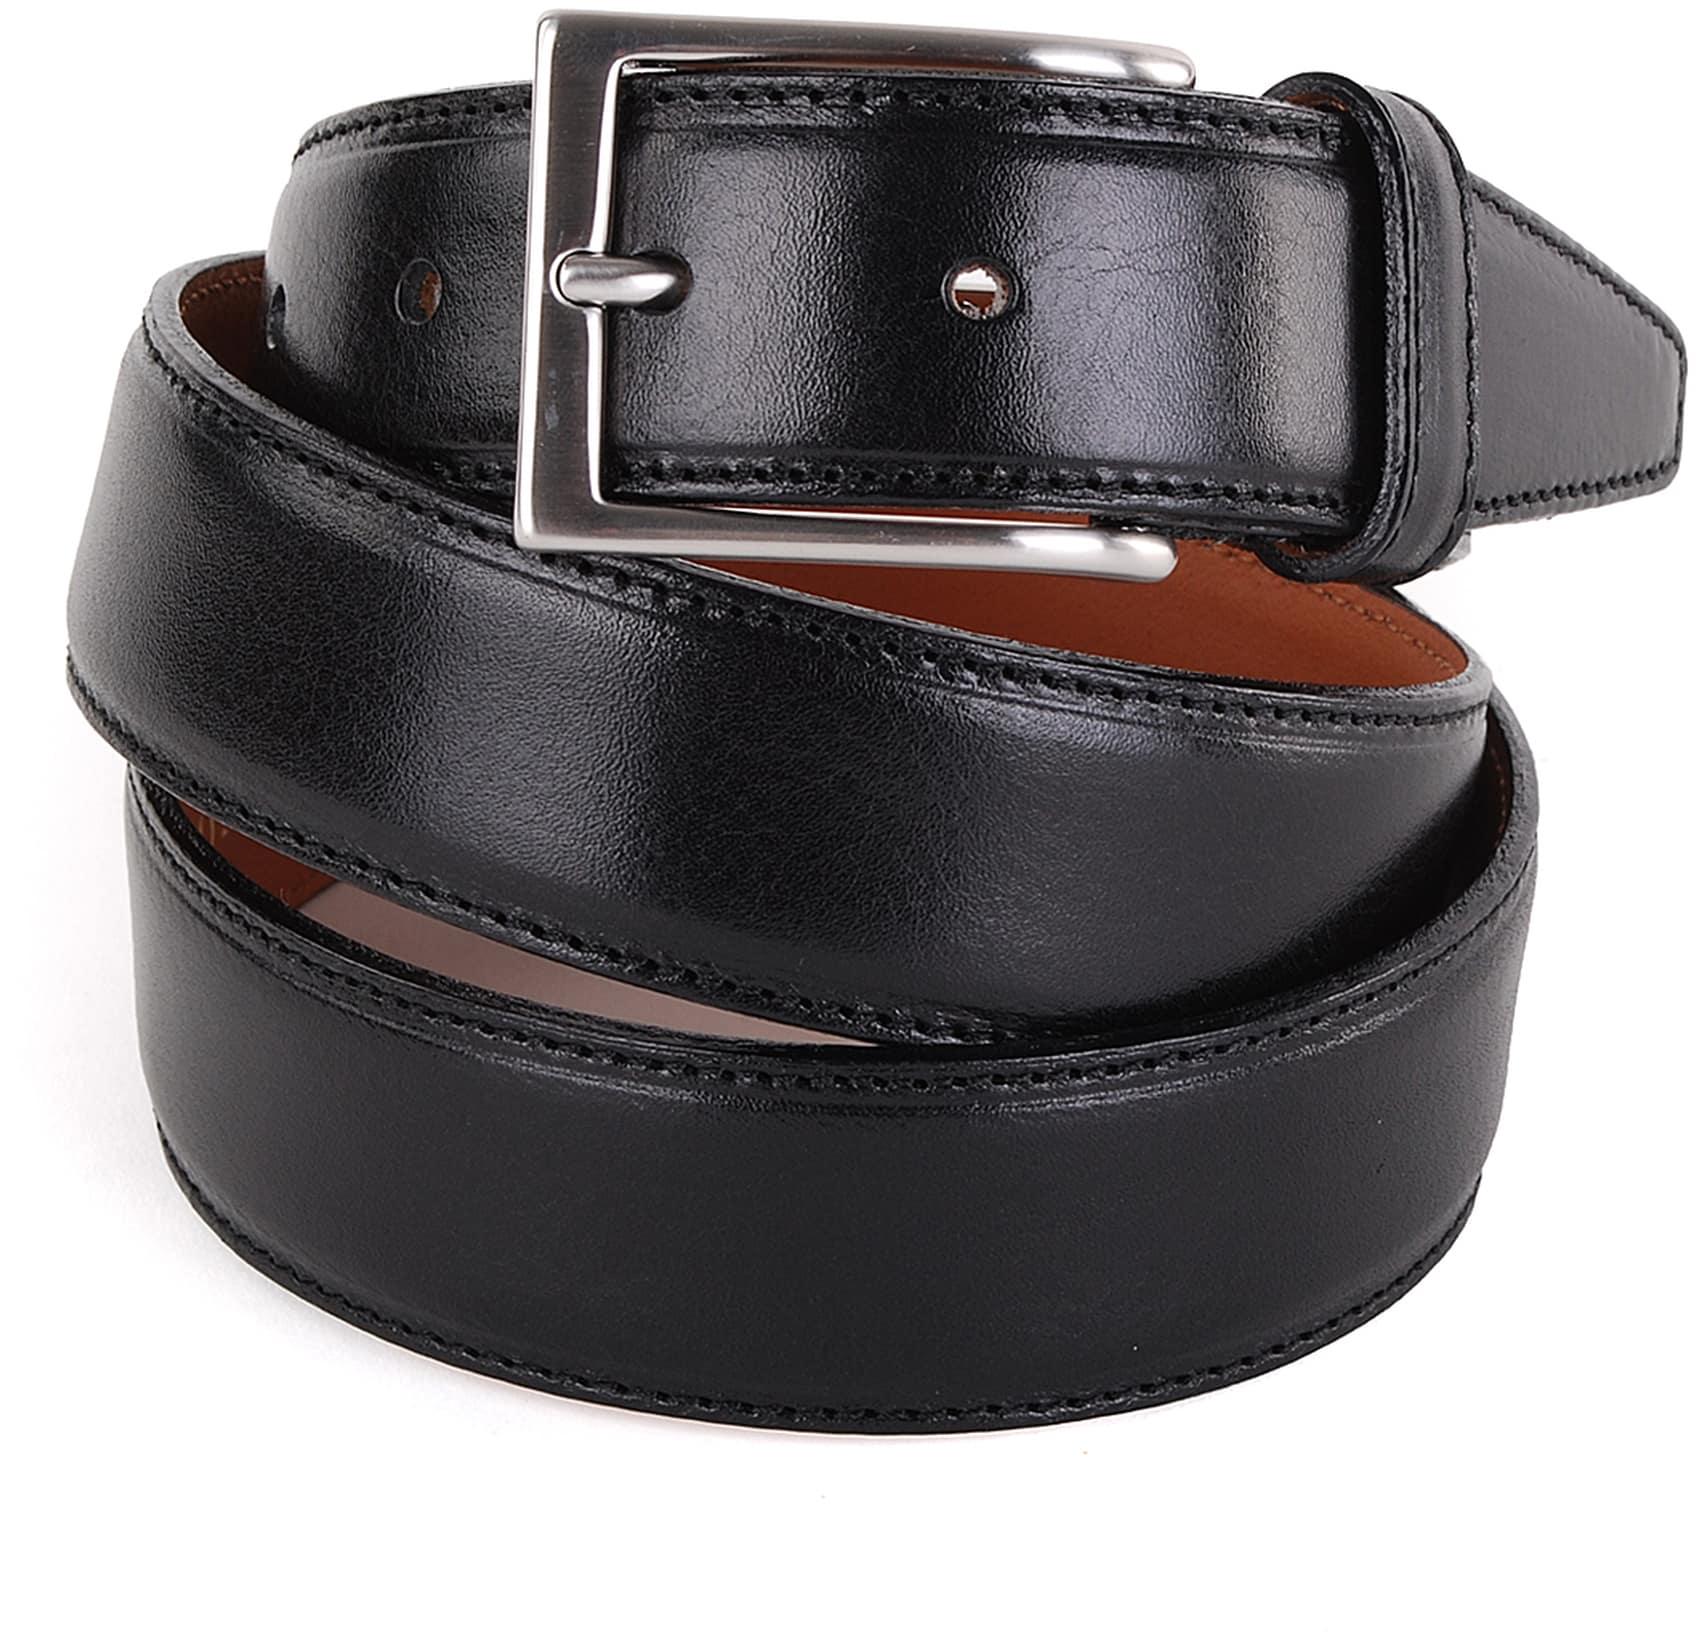 Profuomo Leather Belt Black